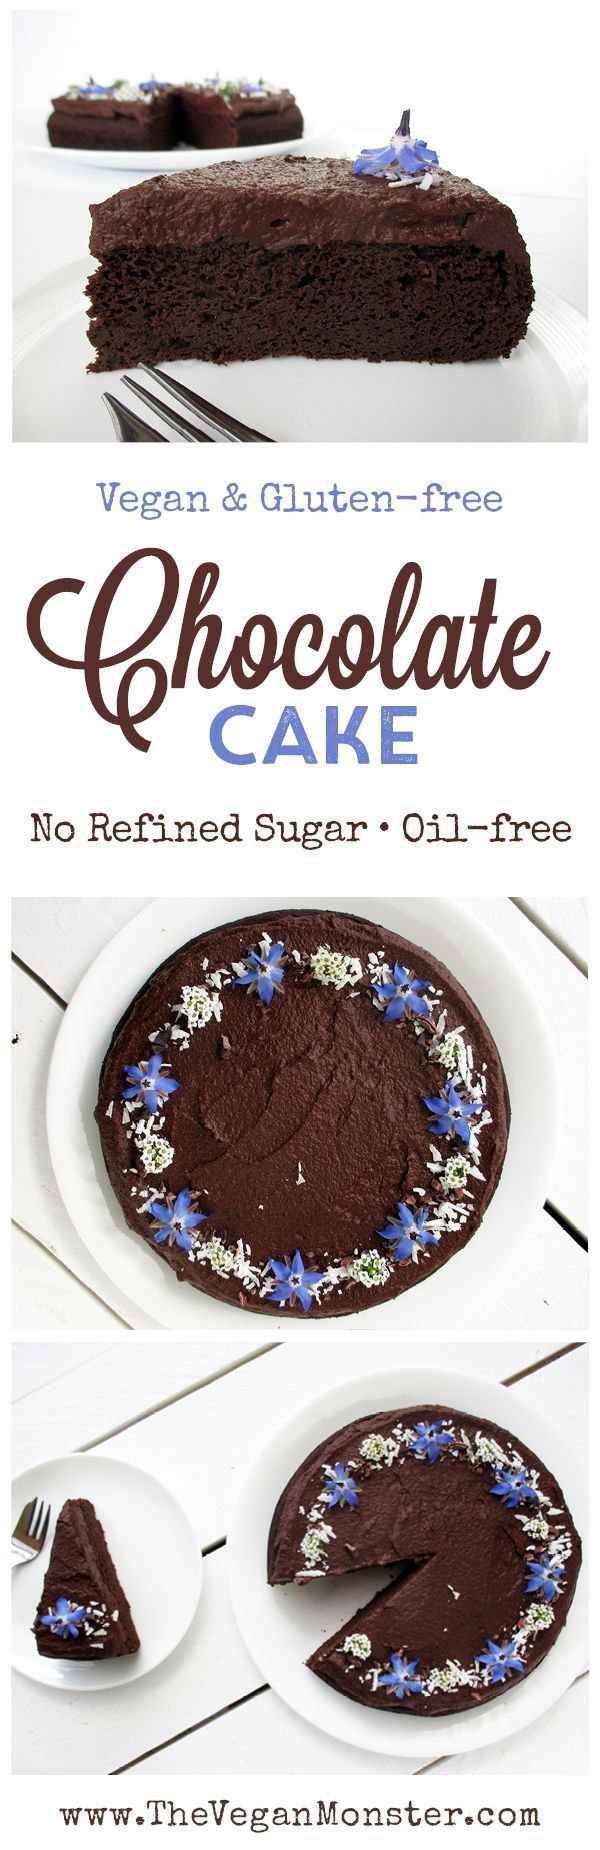 Vegan Gluten-free Oil-free Refined Sugar Free Soy-free Easy Chocolate Cake Recip... -